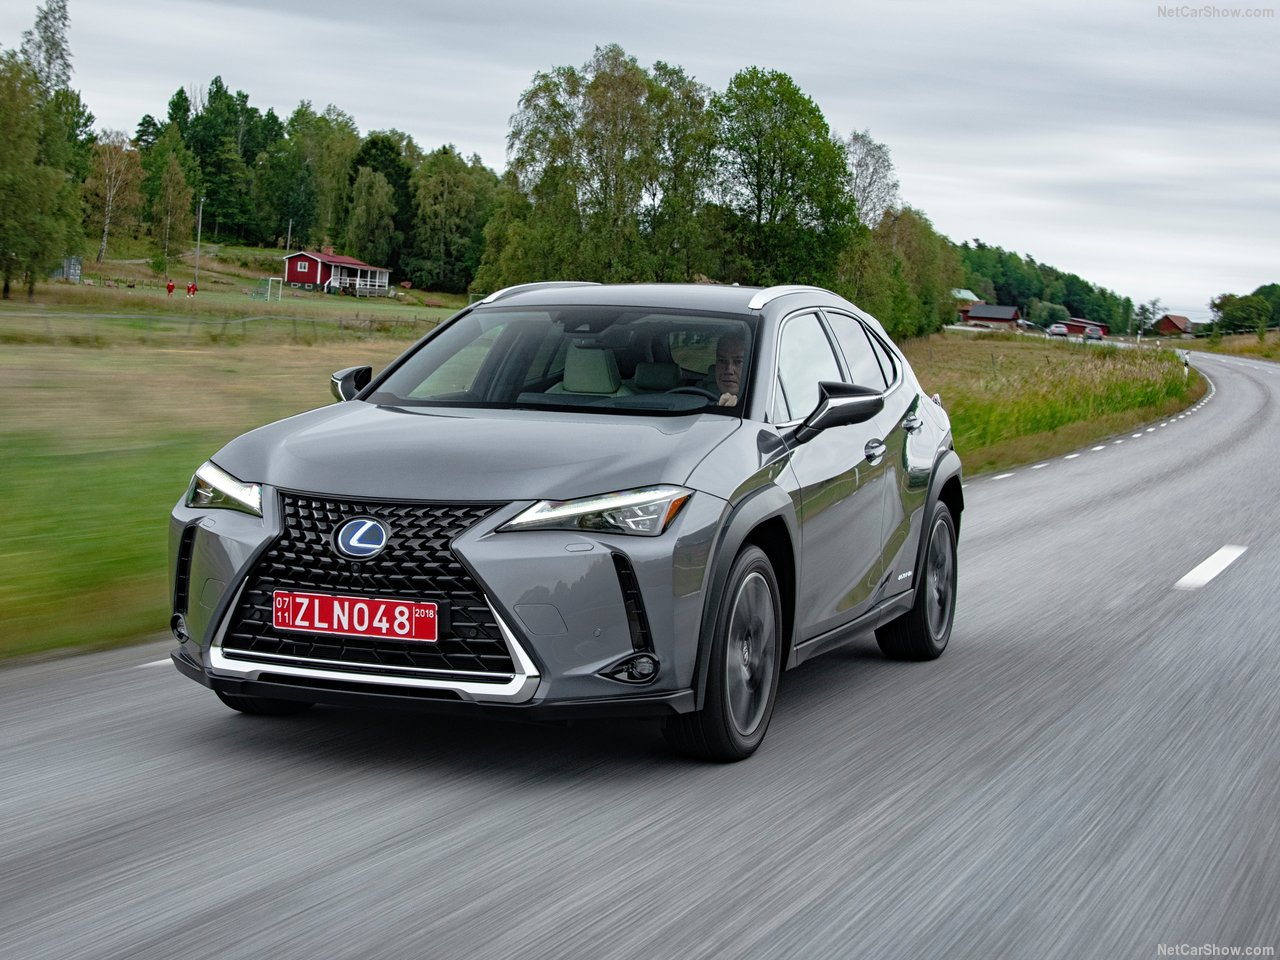 Lexus-UX-2019-1280-29.jpg